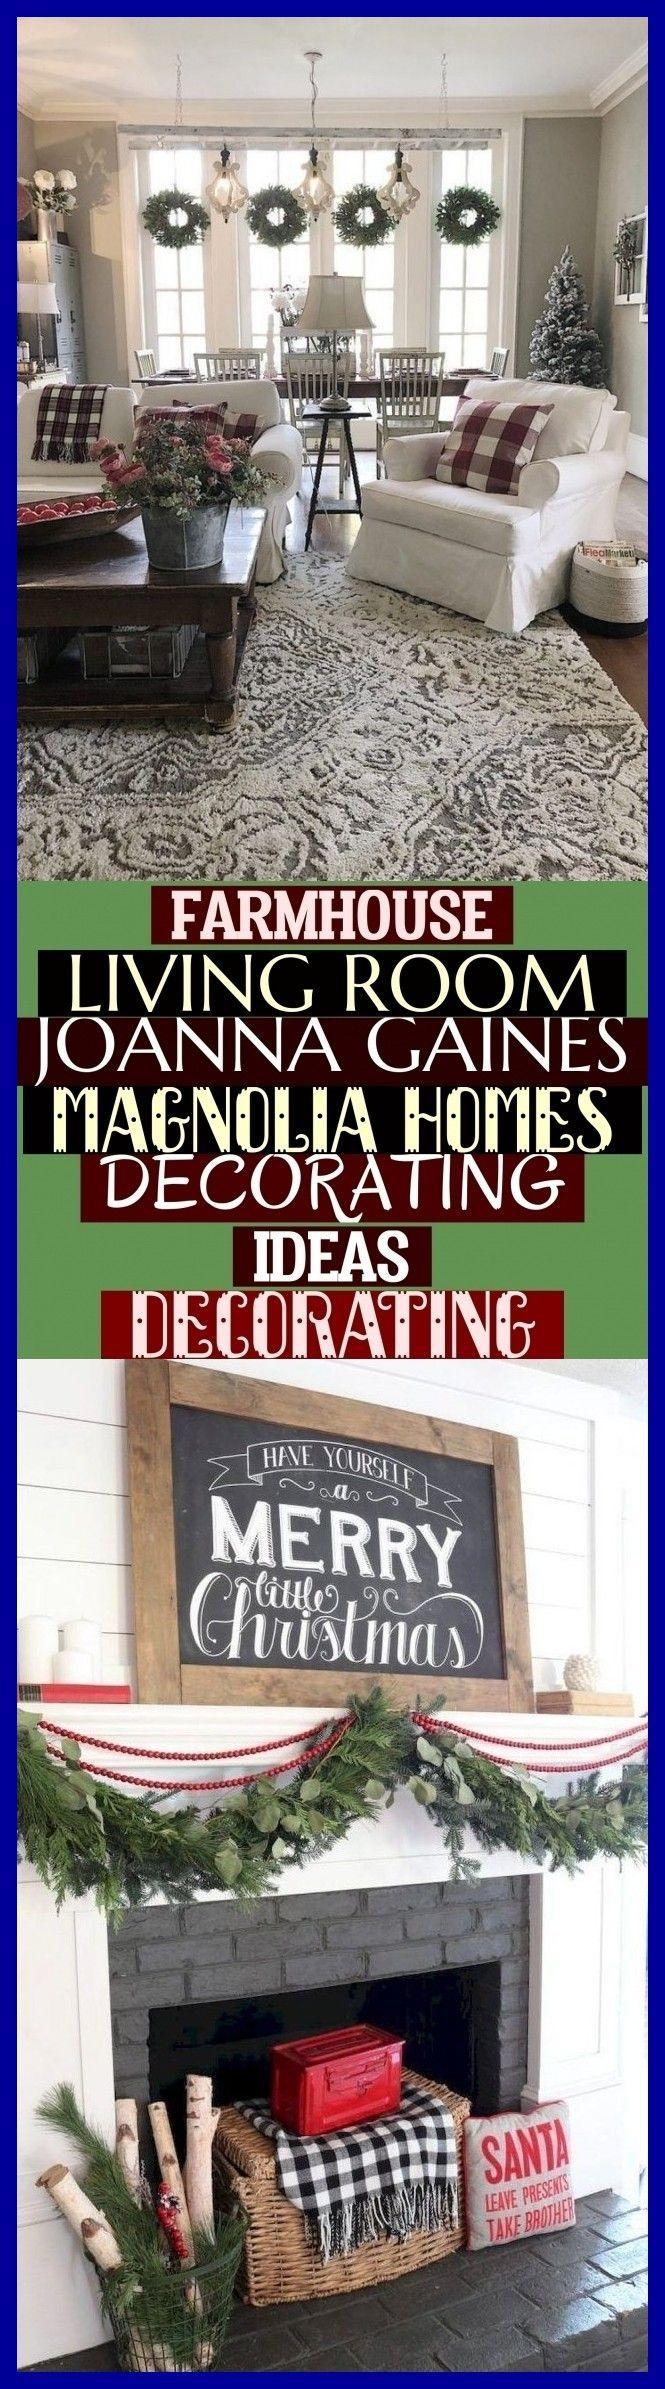 Farmhouse Living Room Joanna Gaines Magnolia Homes ...